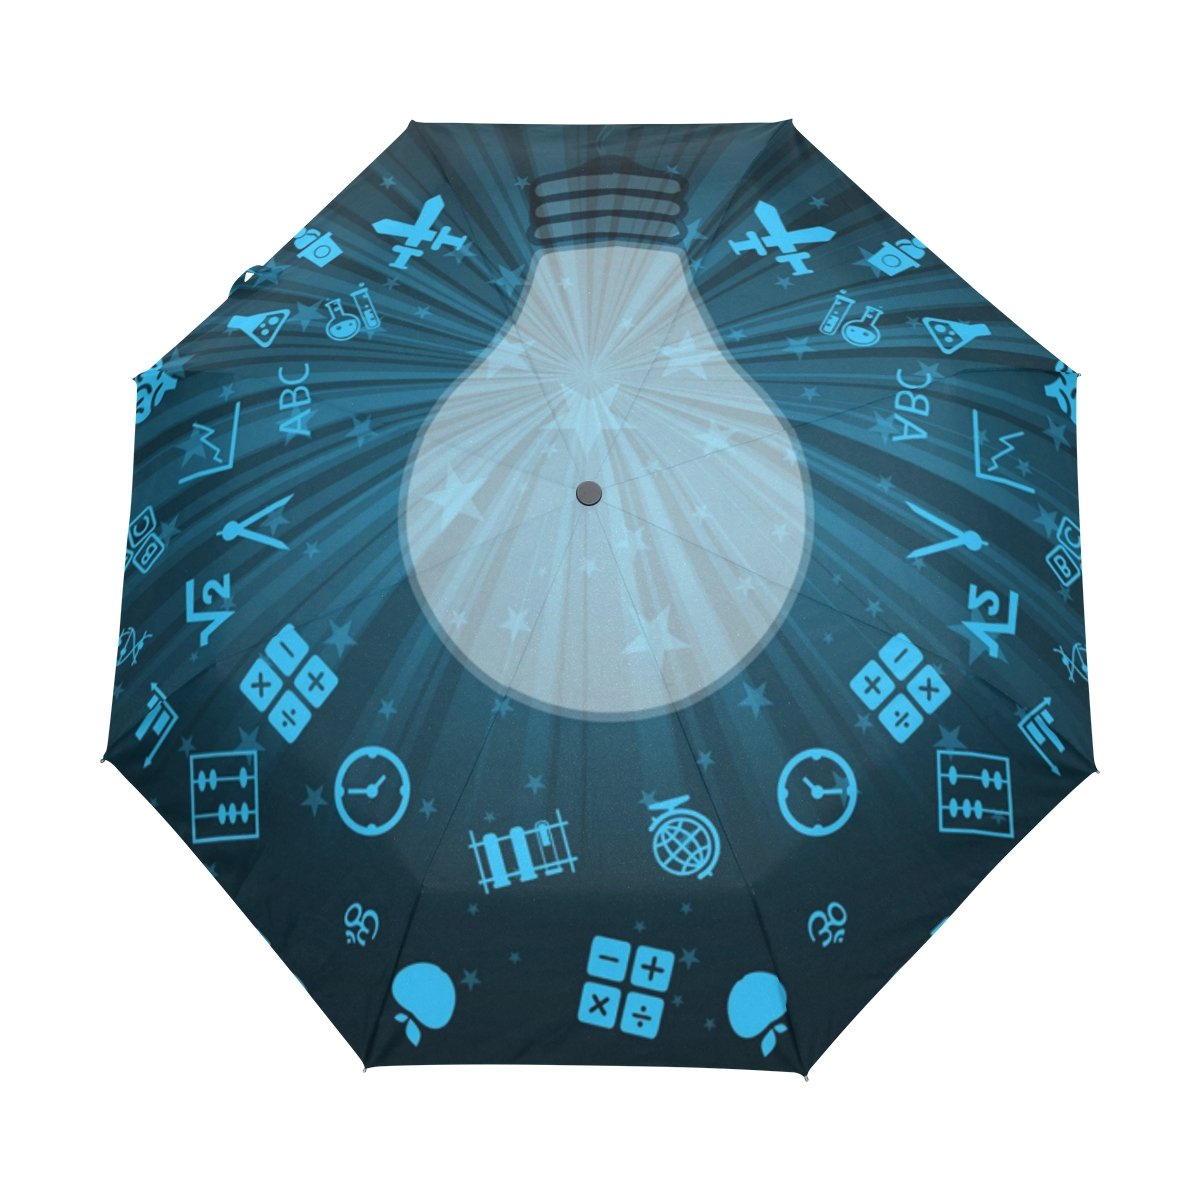 Senya Saobao防風と防雨トラベル傘with自動開いて閉じFolding学習スタイルポータブル折りたたみ式太陽雨傘   B07FFVK94D